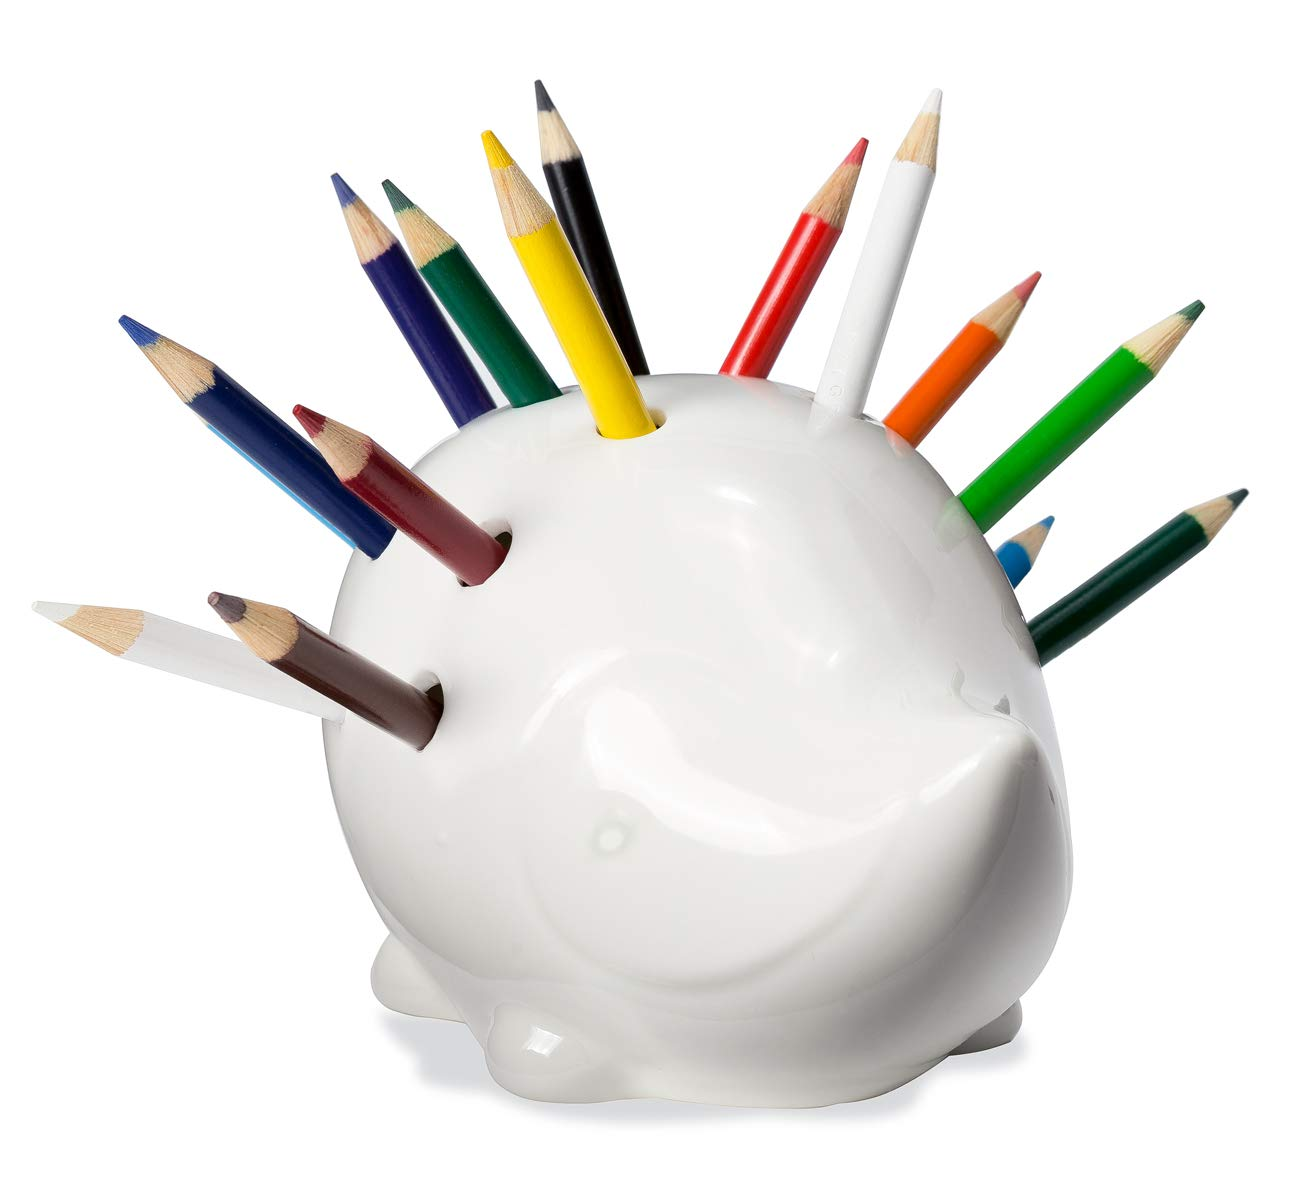 Novelty Creative Artistic Decor Metal Pencil Pen Holder Vase Pot Home Office Table Decoration Holiday Birthday Art Gift Pen Holders